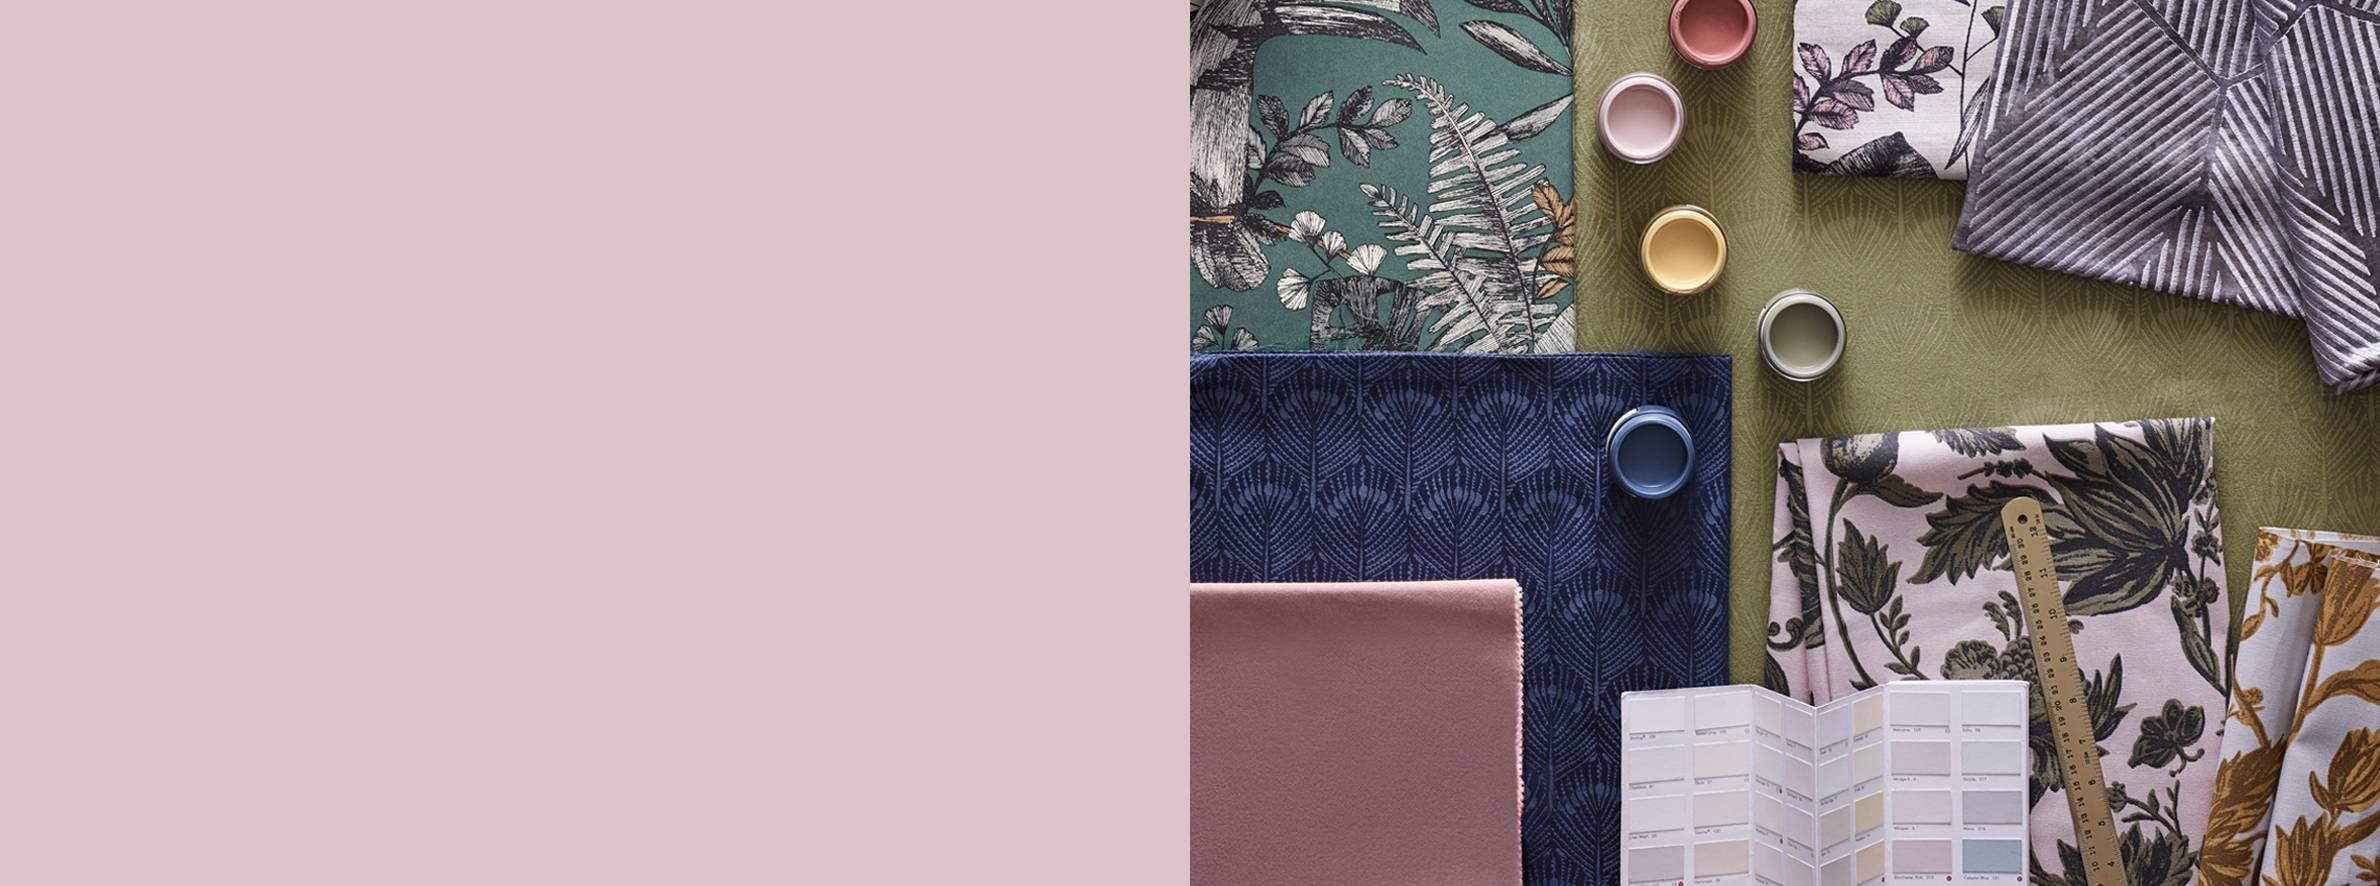 Fabric Laundry Hamper Nz: John Lewis & Partners